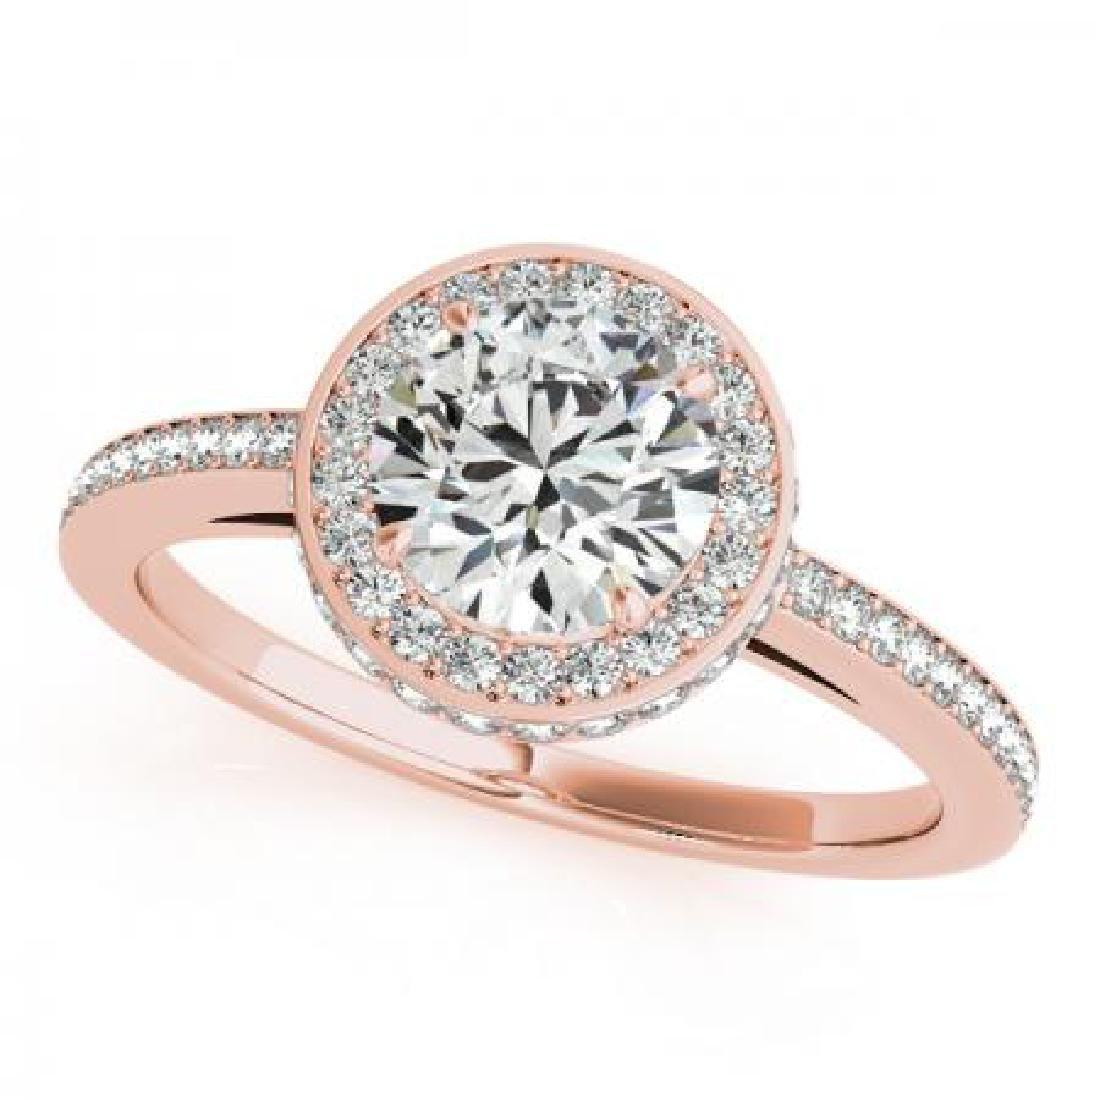 CERTIFIED 18K ROSE GOLD 1.46 CT G-H/VS-SI1 DIAMOND HALO